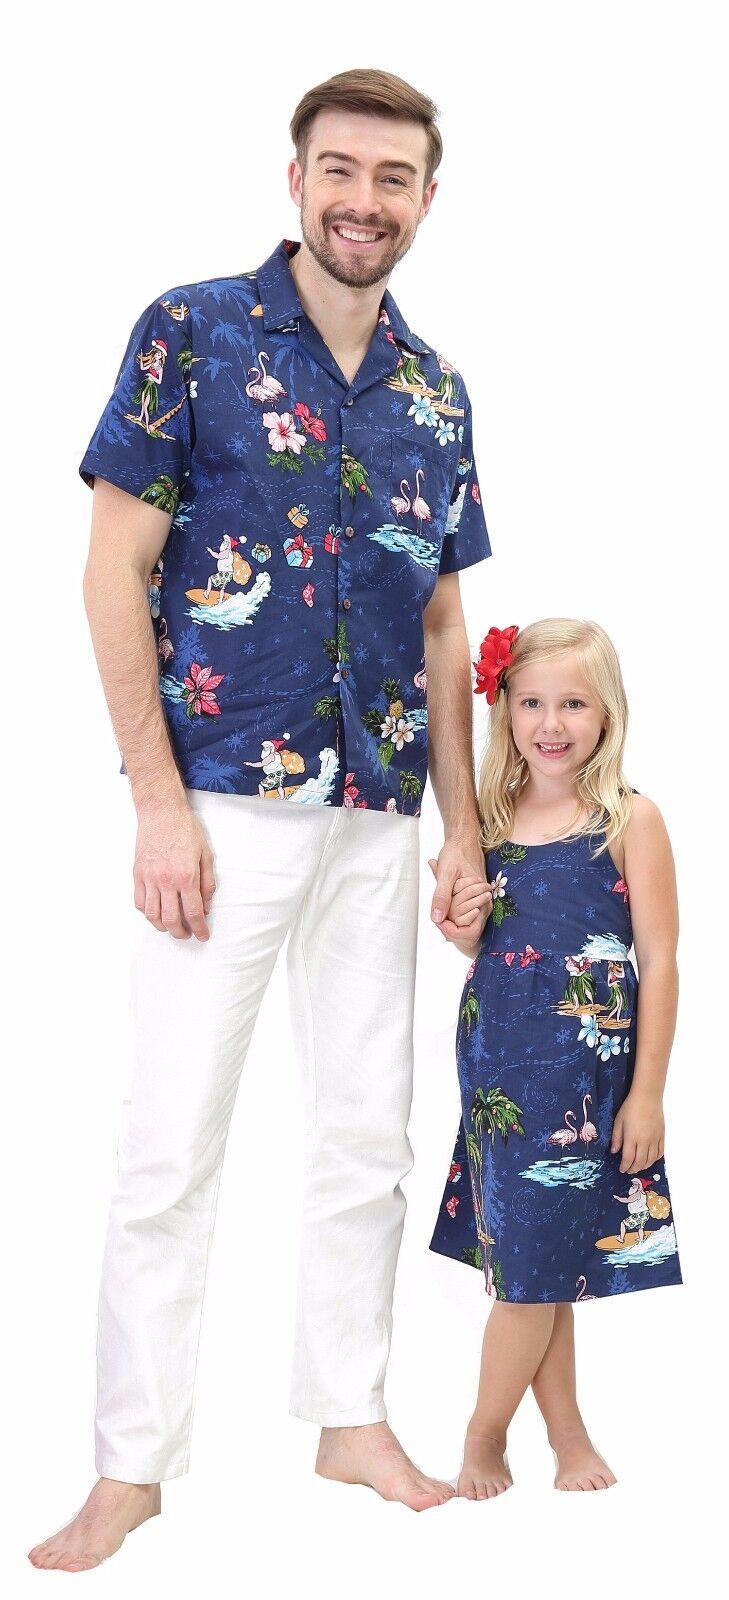 Christmas Santa in Hawaii Father Daughter Matching Luau Dance Shirt Dress Navy